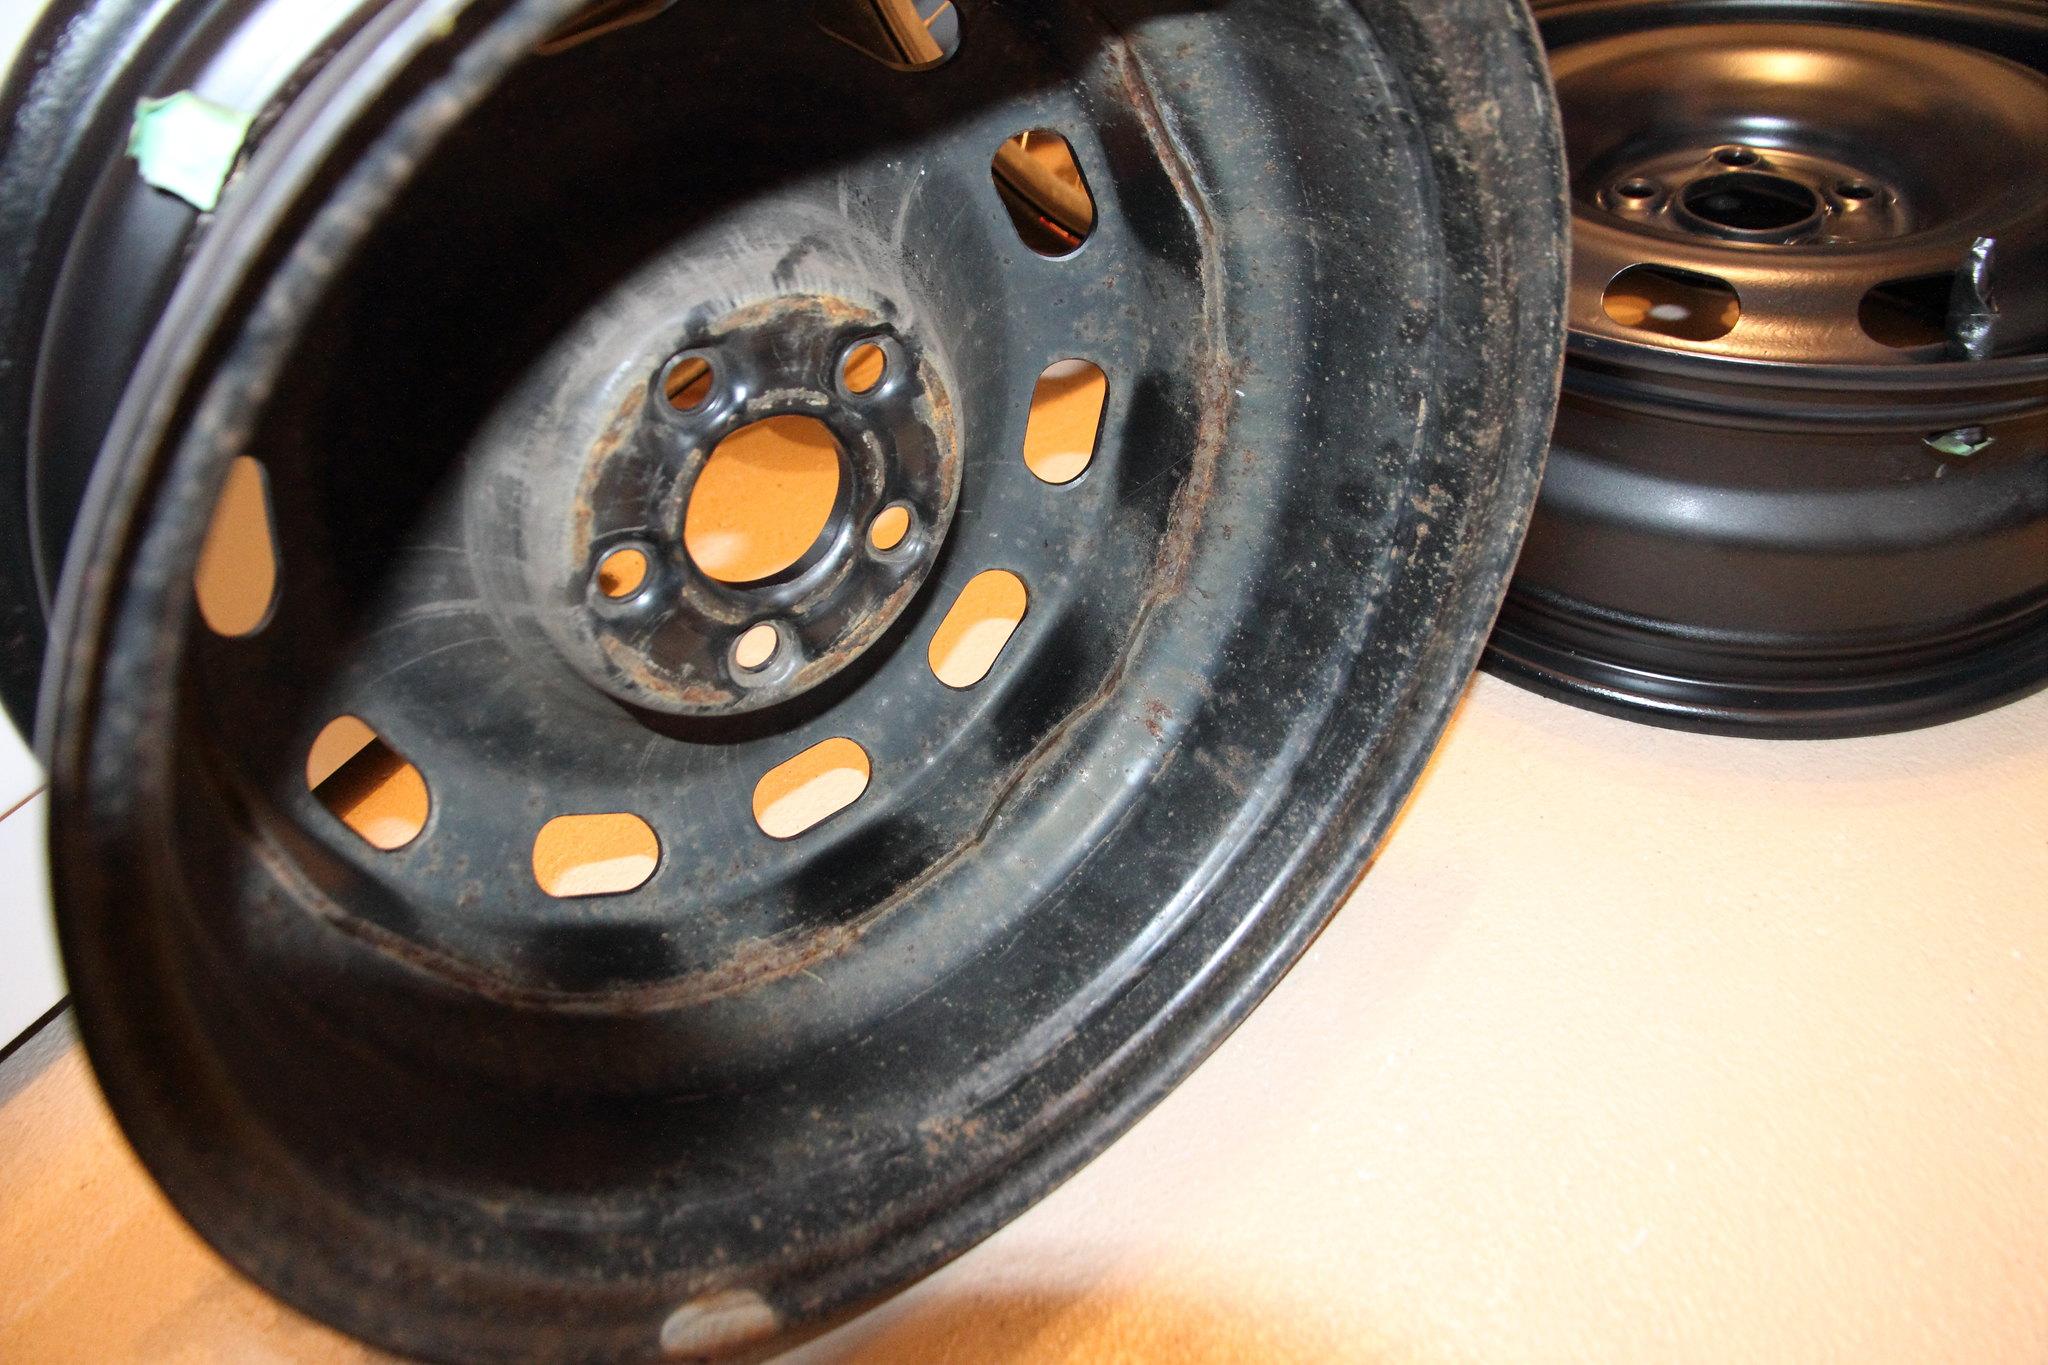 Rustoleum Flat Black Paint Gallon